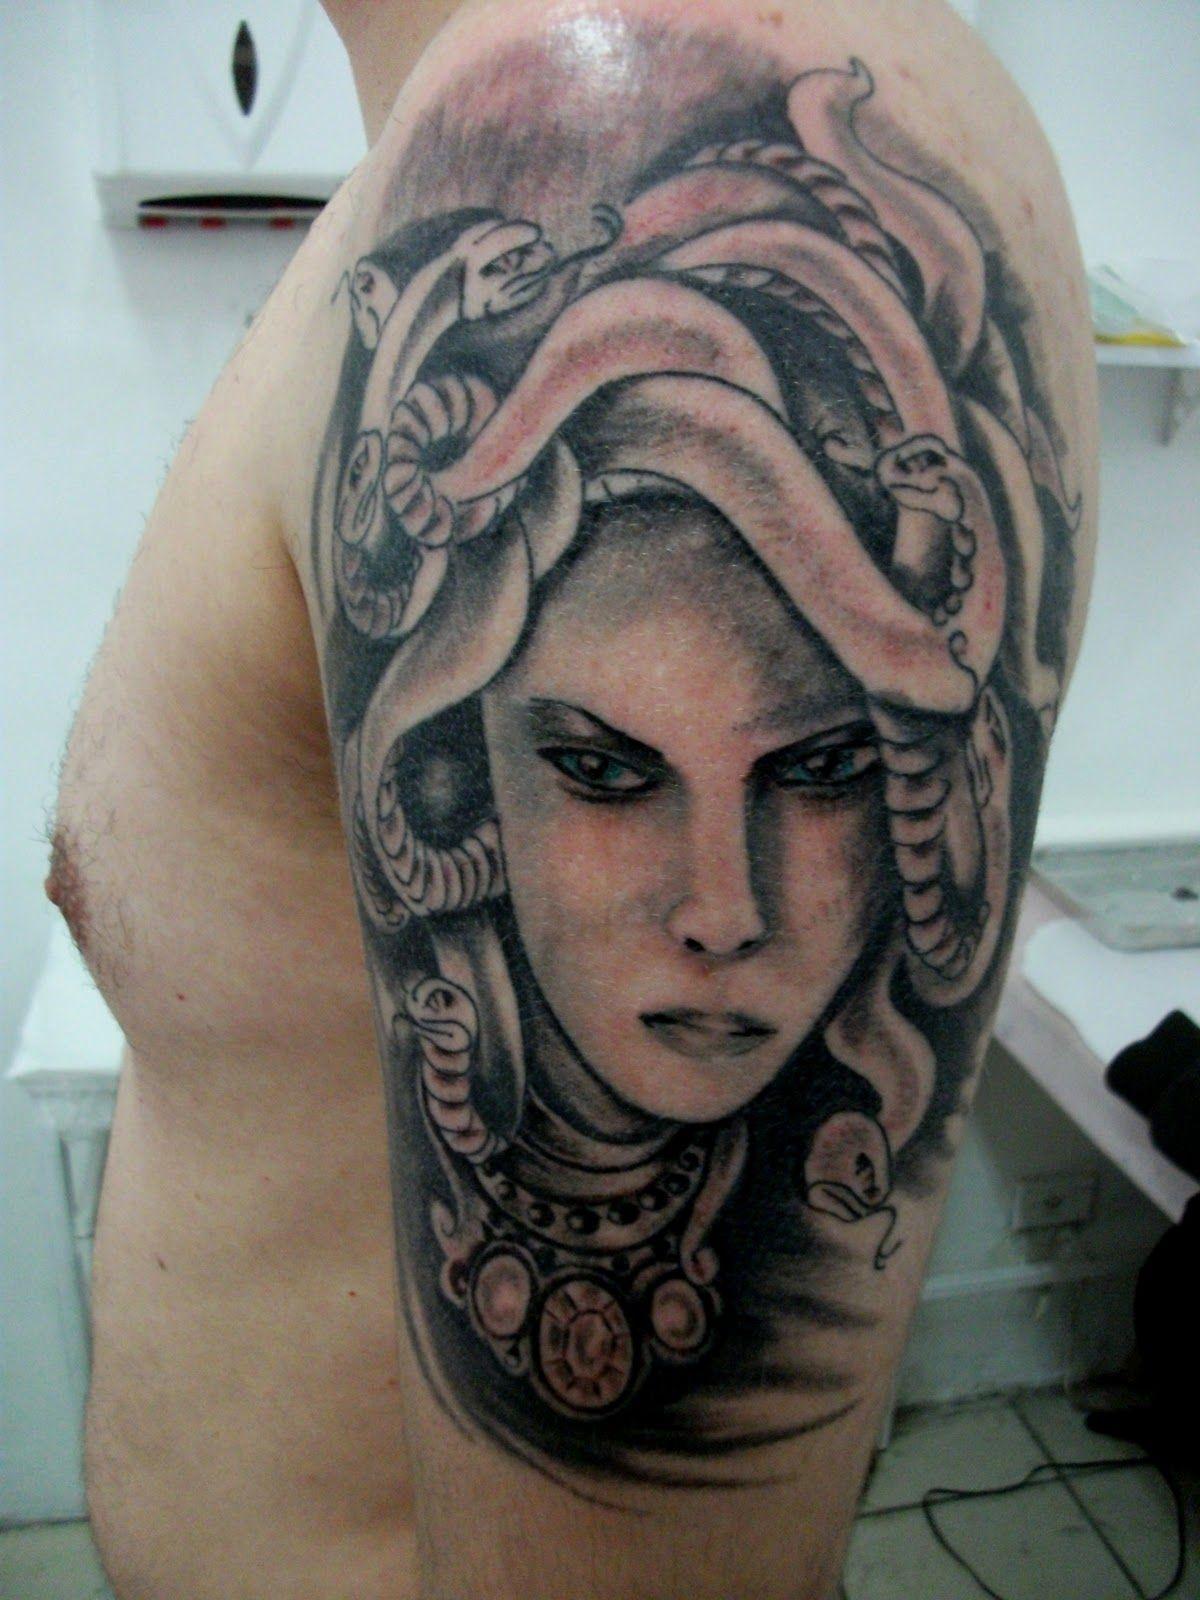 Medusa Artwork Tattoo: Medusa Tattoo Design, Medusa